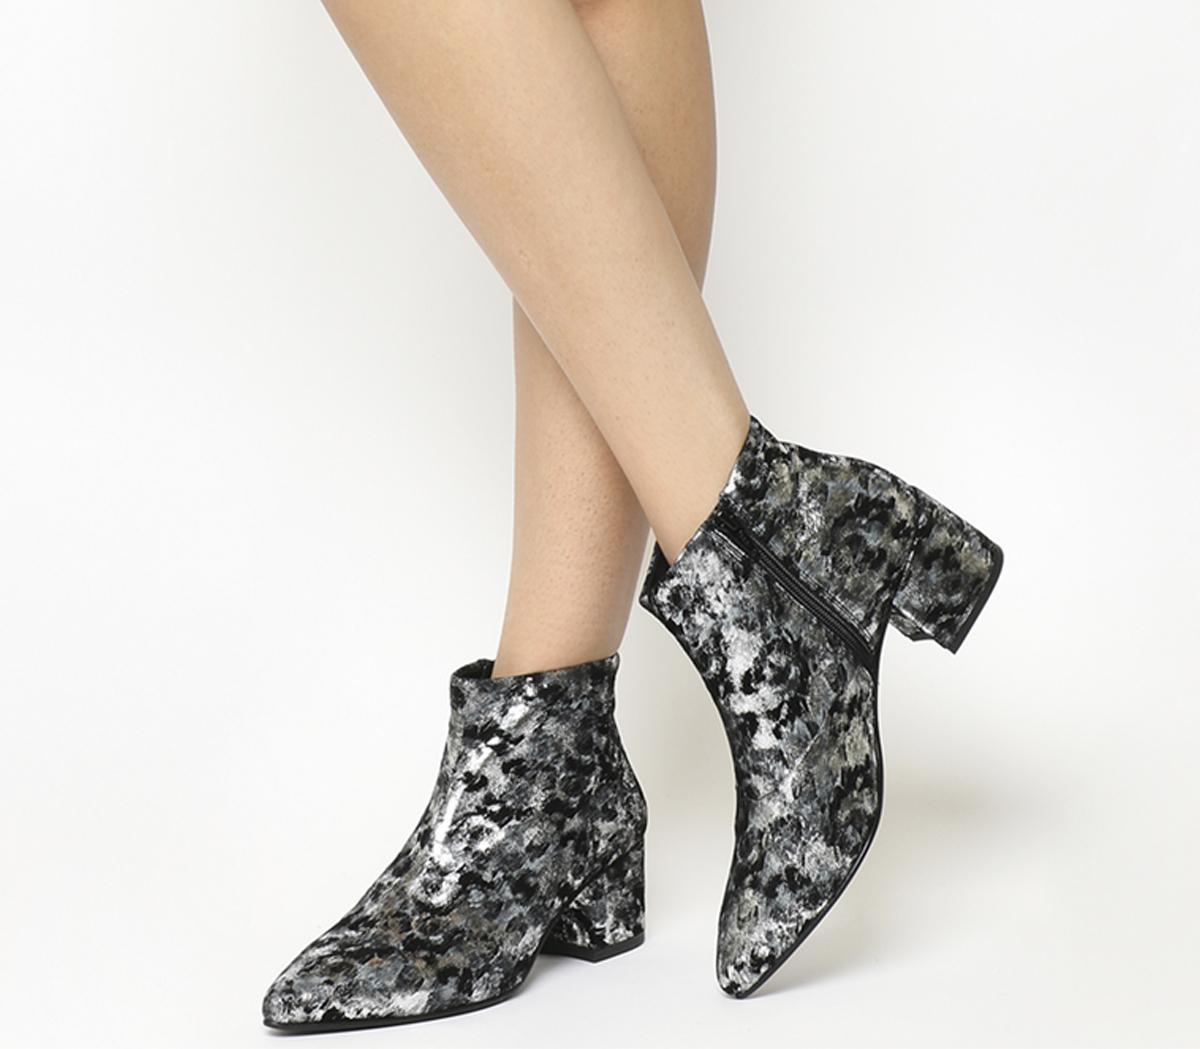 Mya Boots